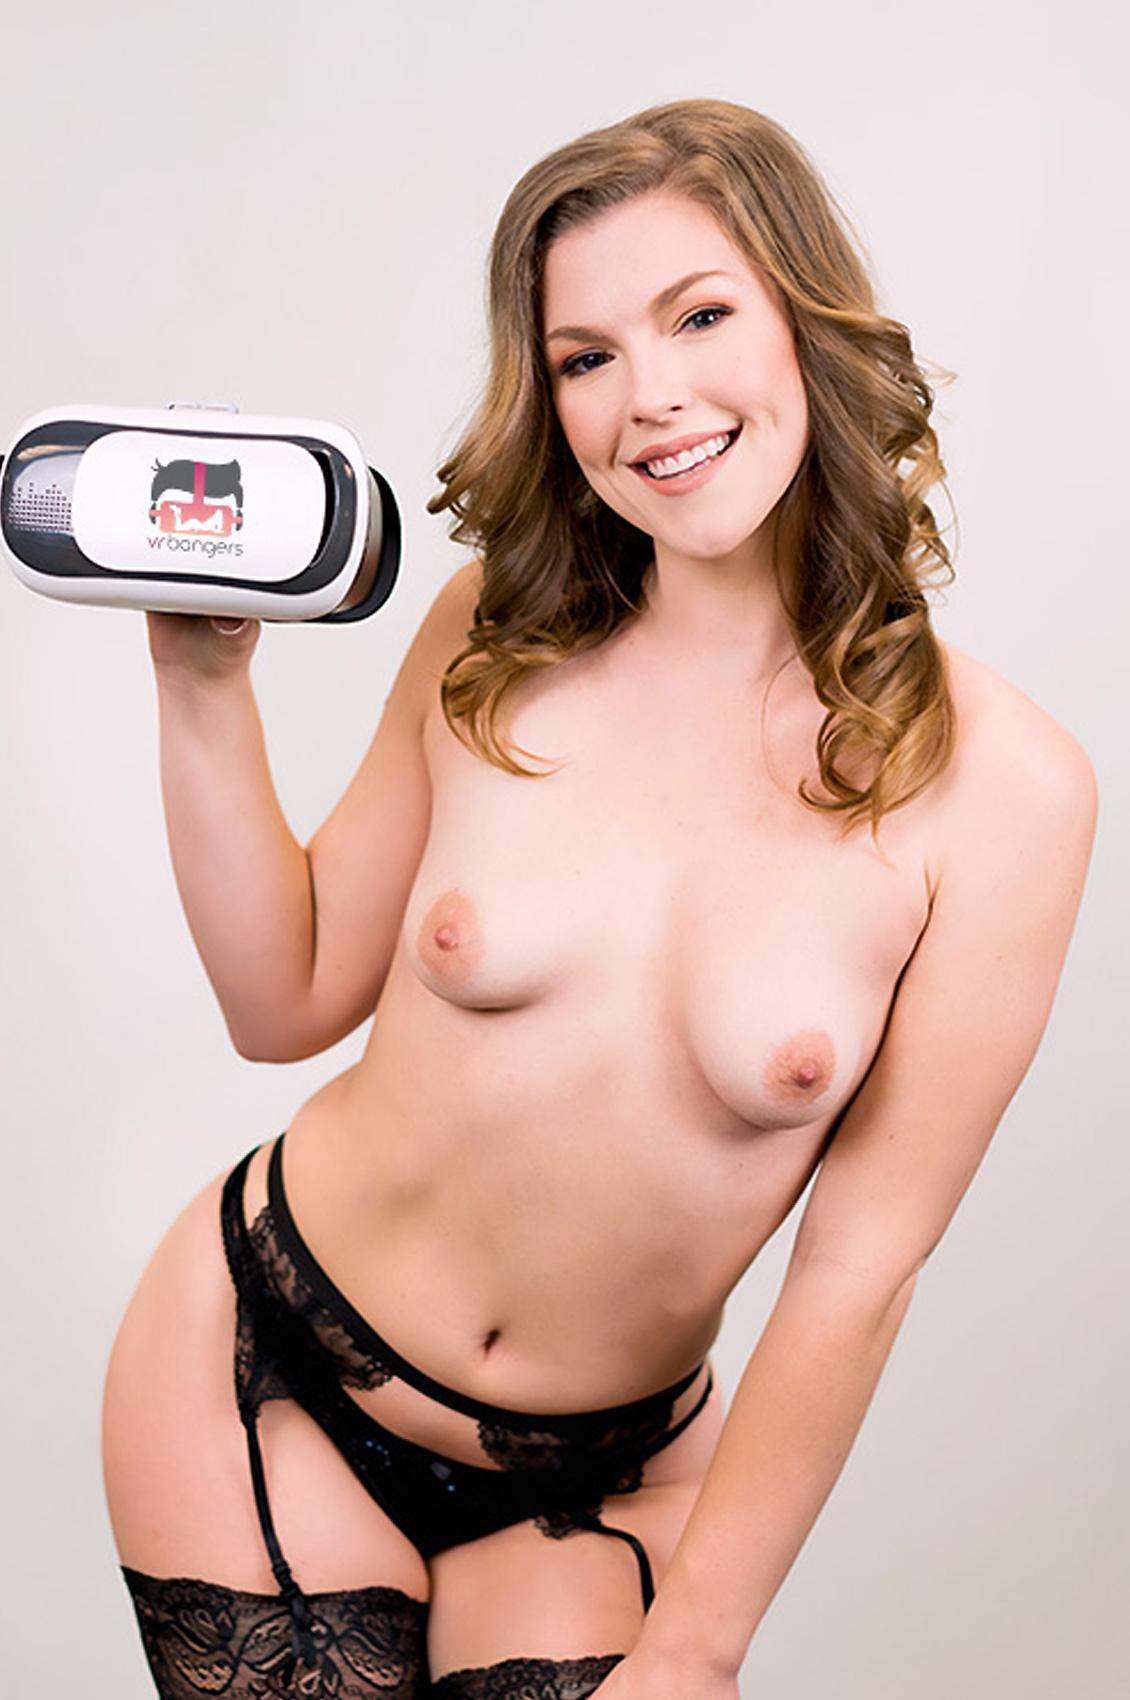 Ella Nova's VR Porn Videos, Bio & Free Nude Pics